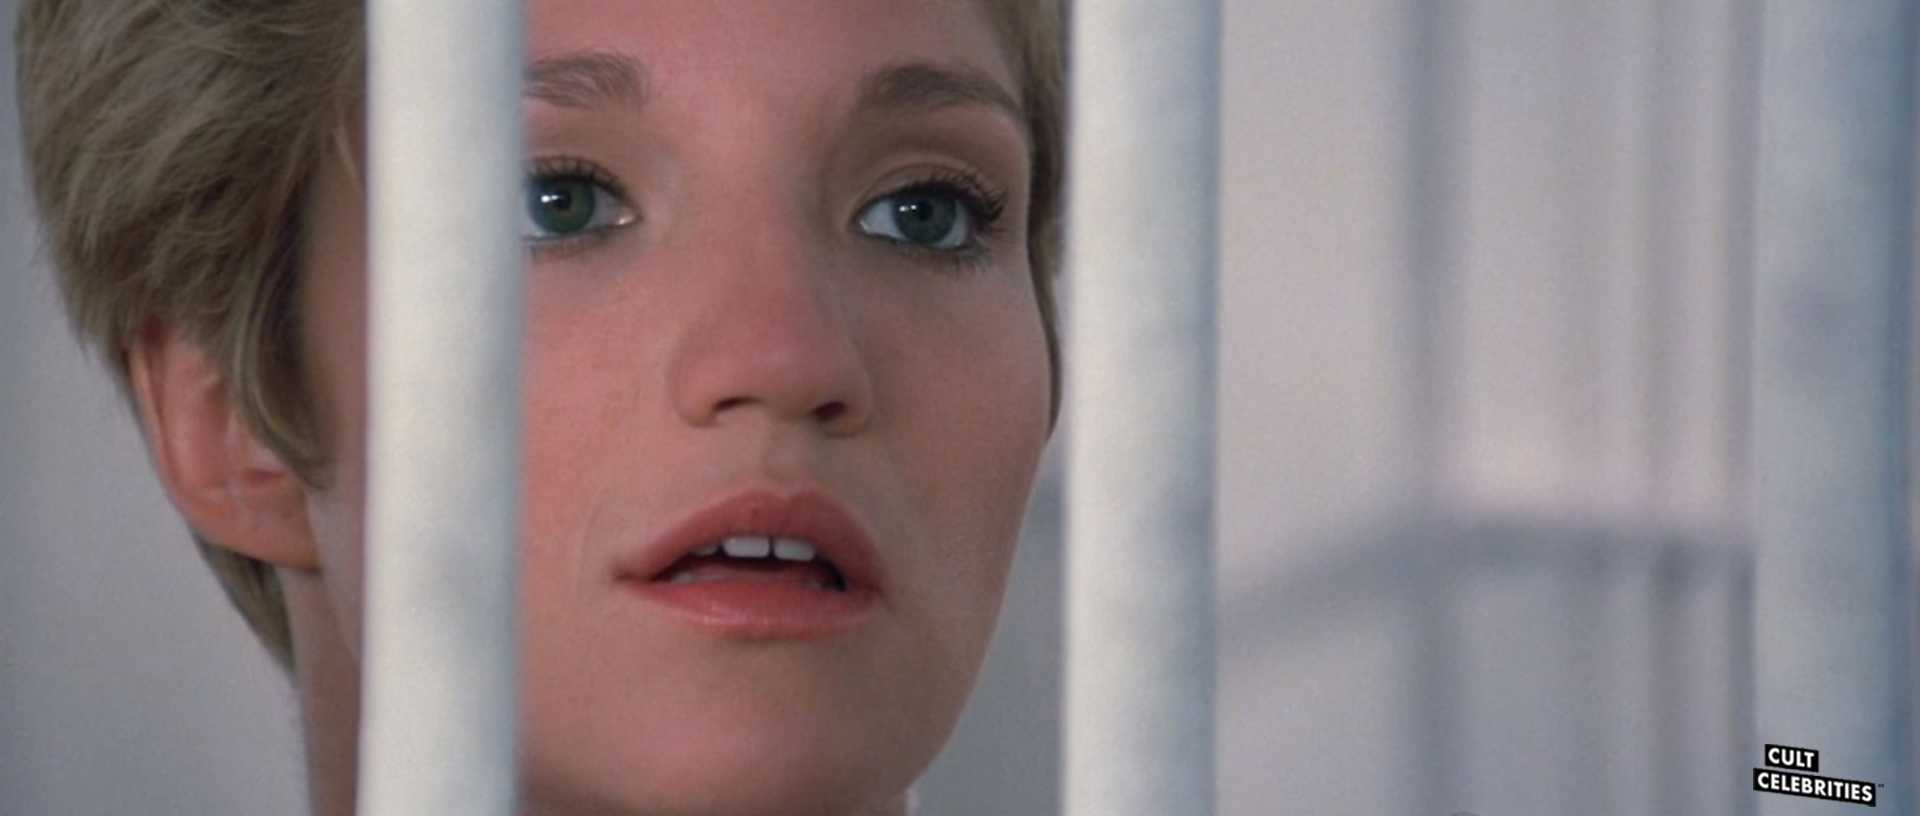 Ellen Barkin in The Adventures of Buckaroo Banzai Across the 8th Dimension (1984)